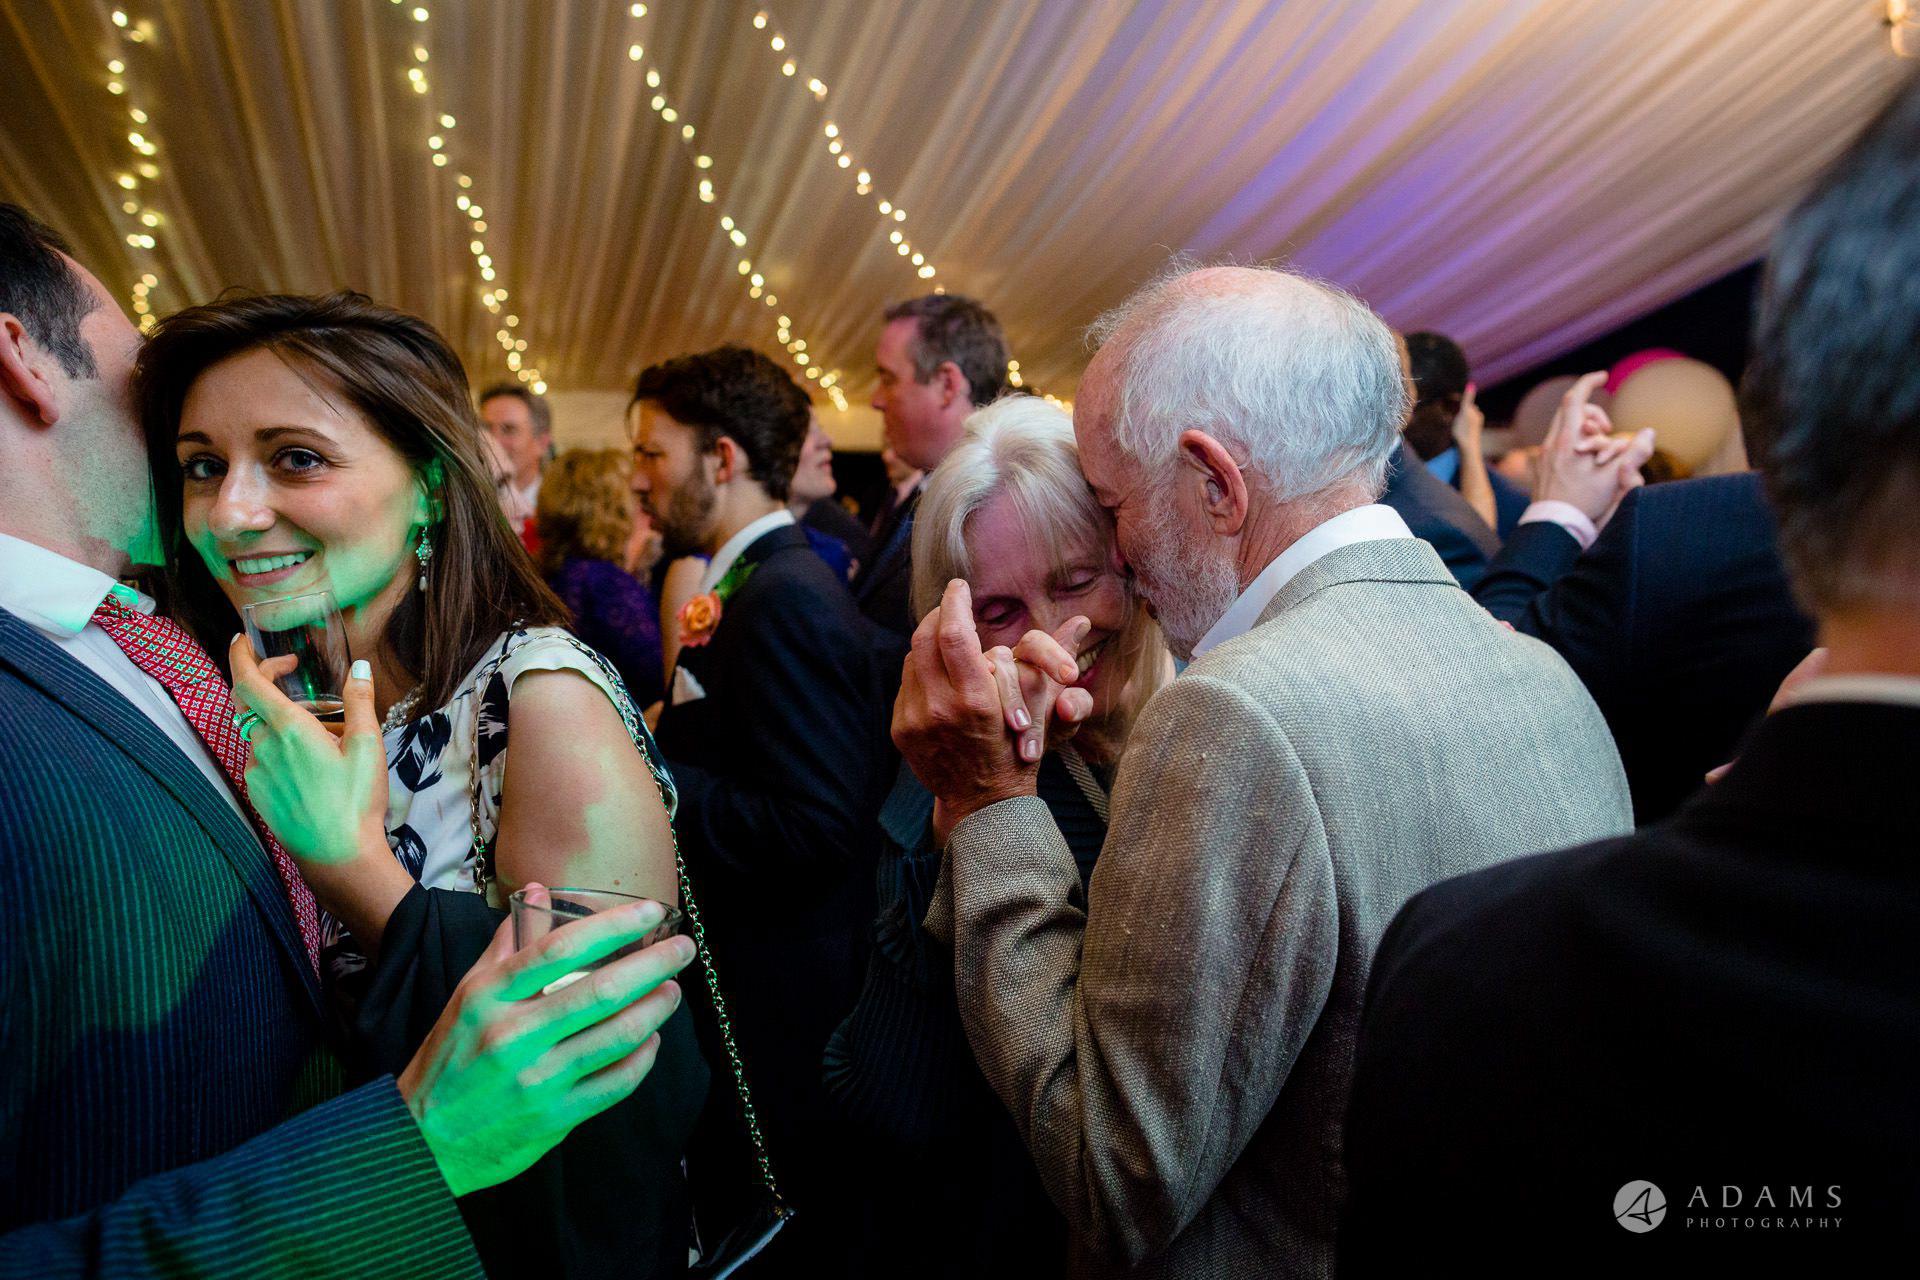 Clare College wedding guests dancing